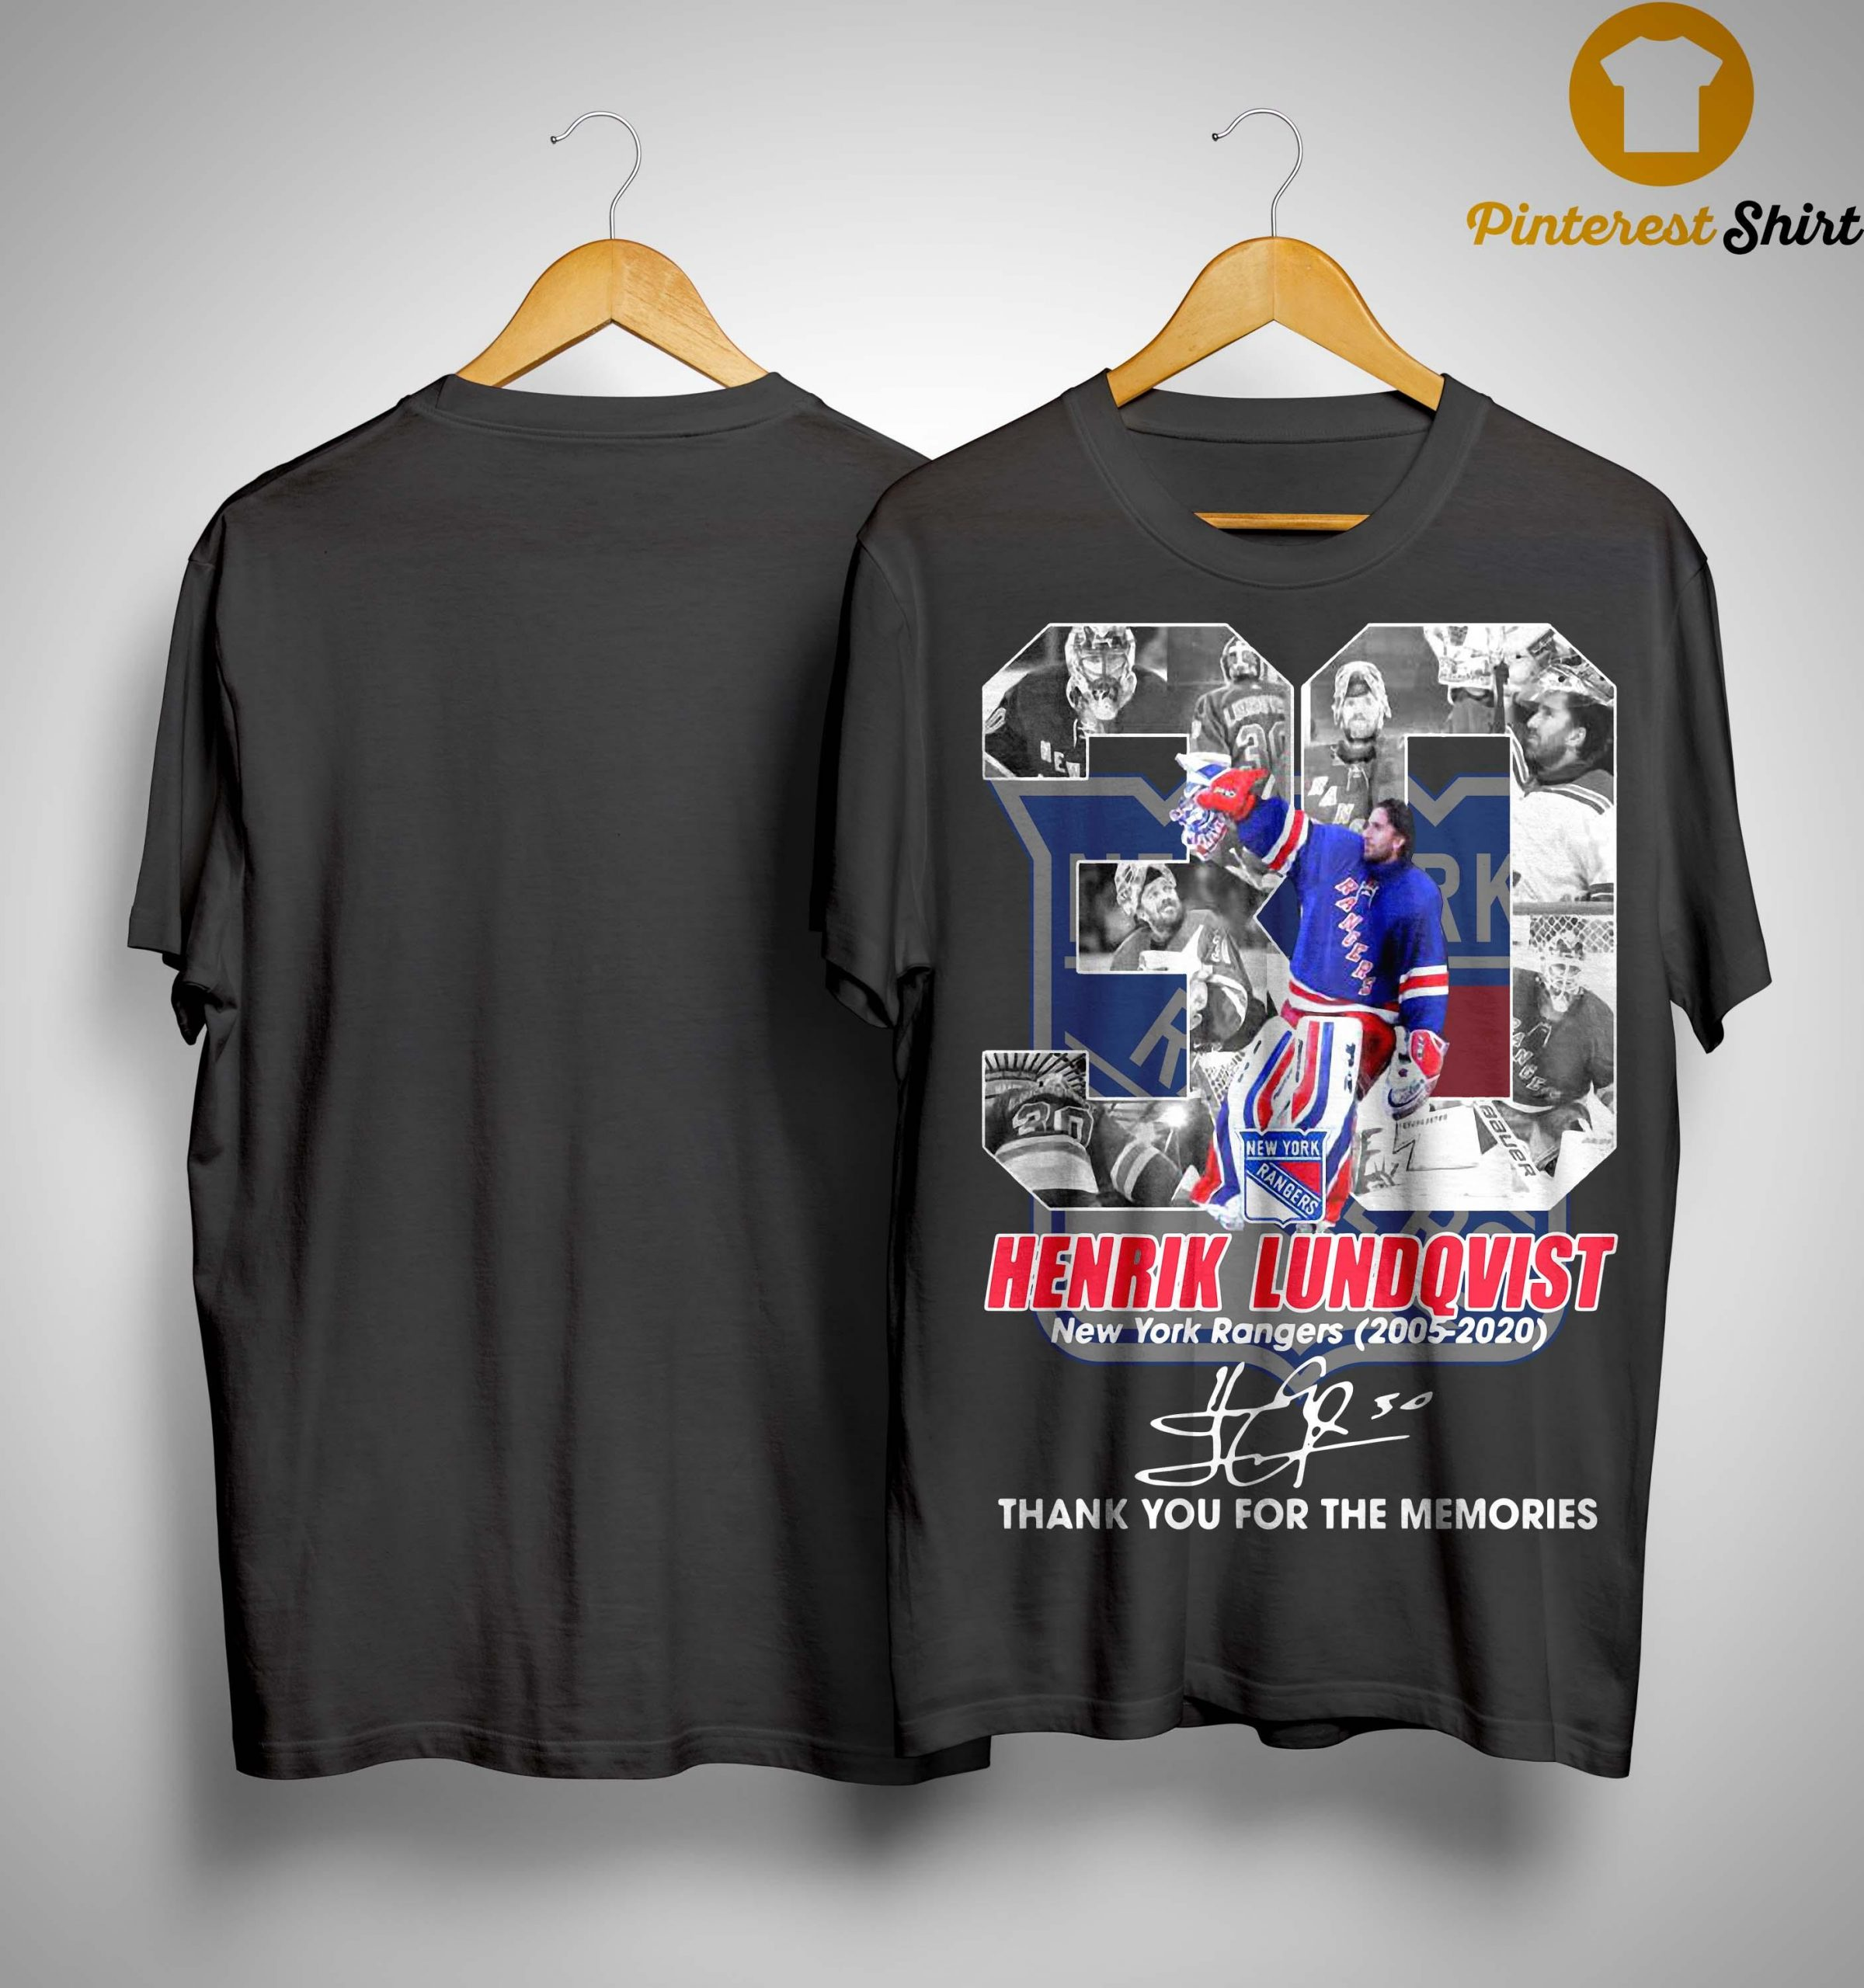 30 Henrik Lundqvist New York Rangers Thank You For The Memories Shirt